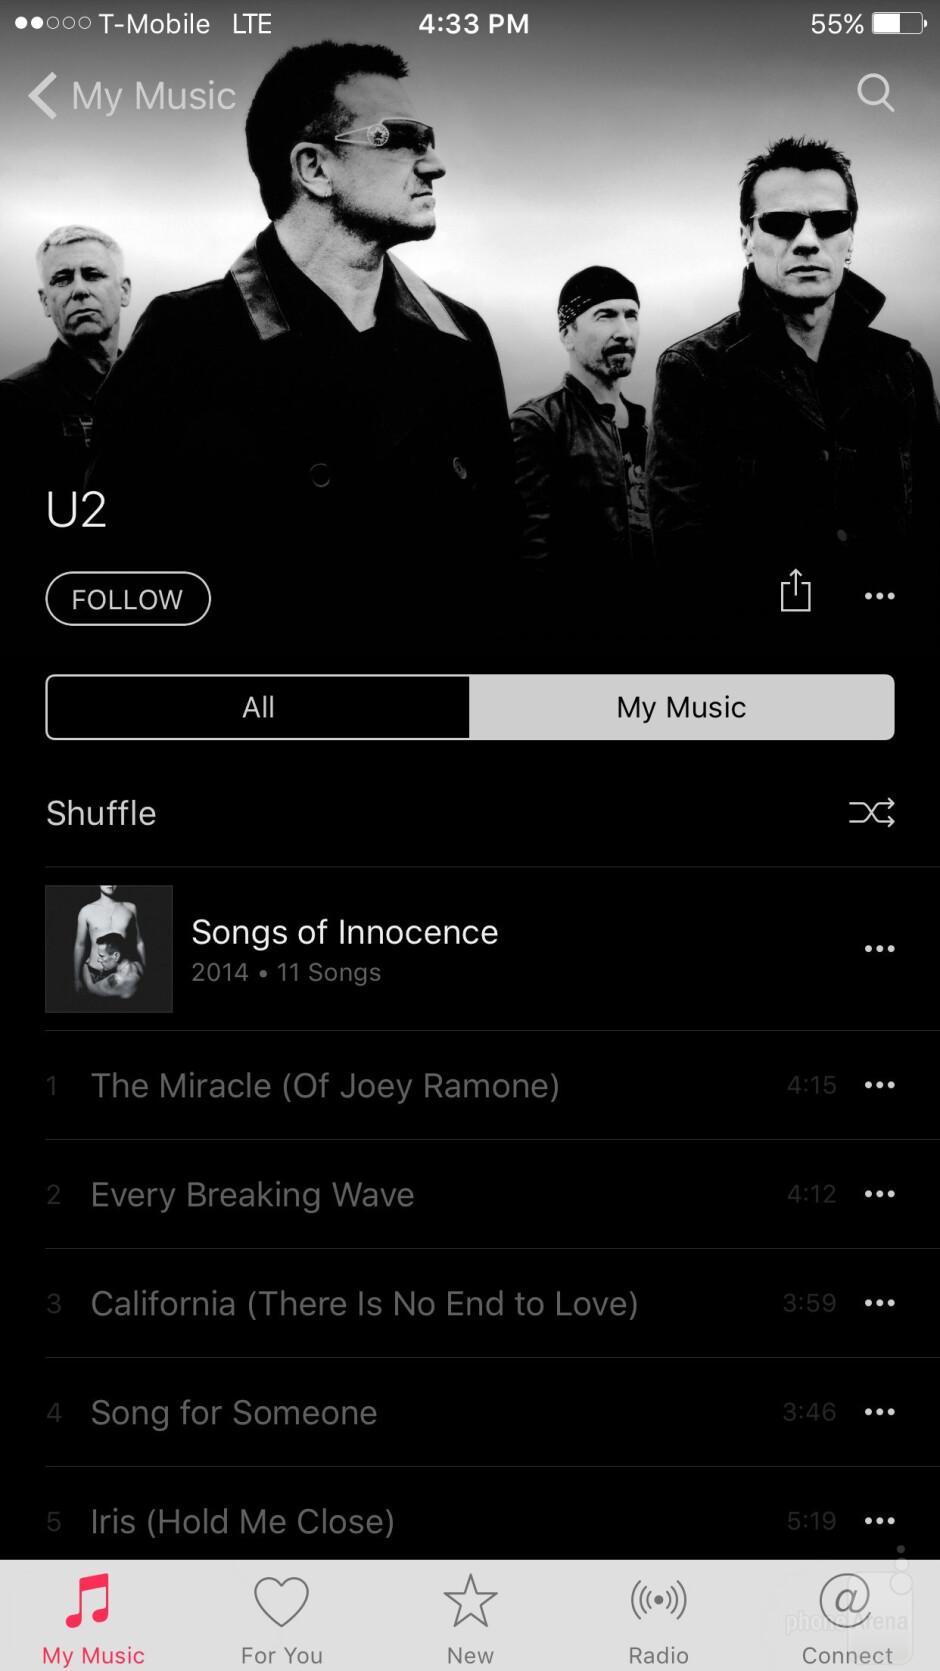 Music players - LG G5 vs Apple iPhone 6s Plus